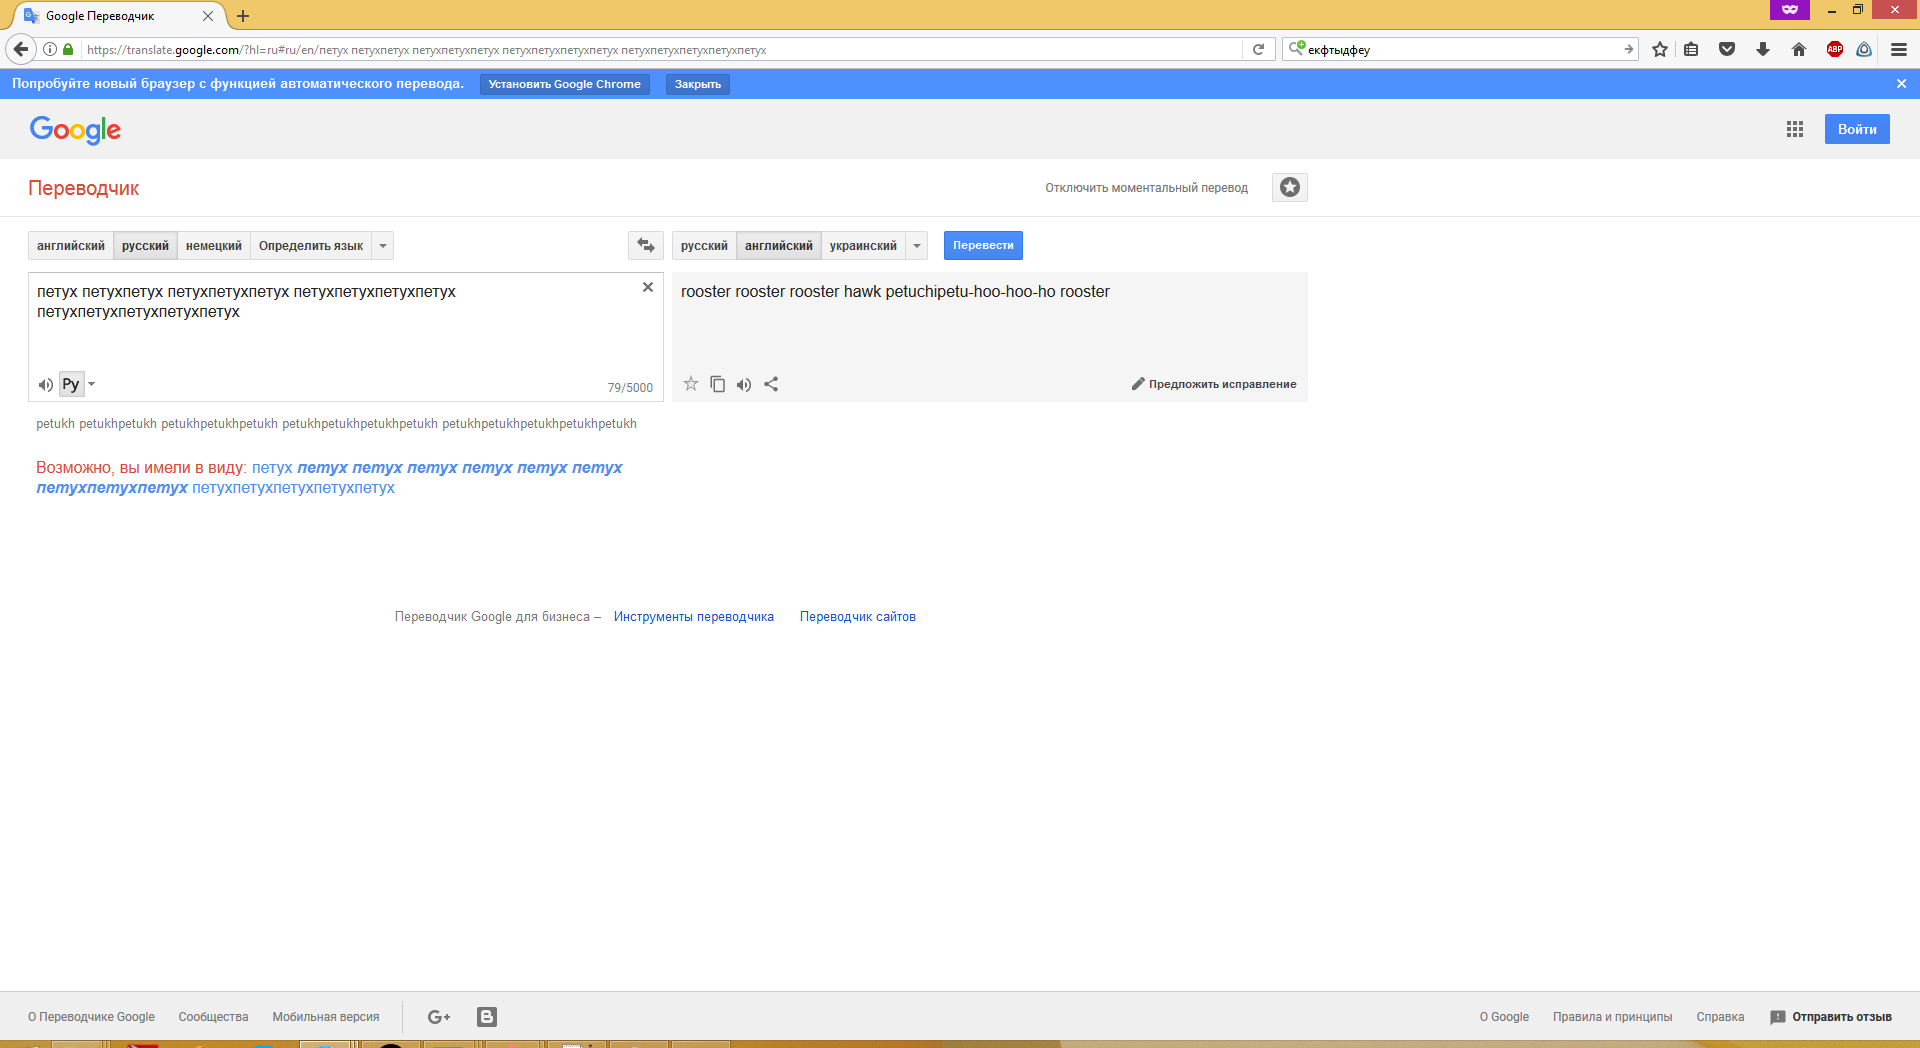 Screenshot 2017-09-02 21.24.39   FUN Google Ttranslate